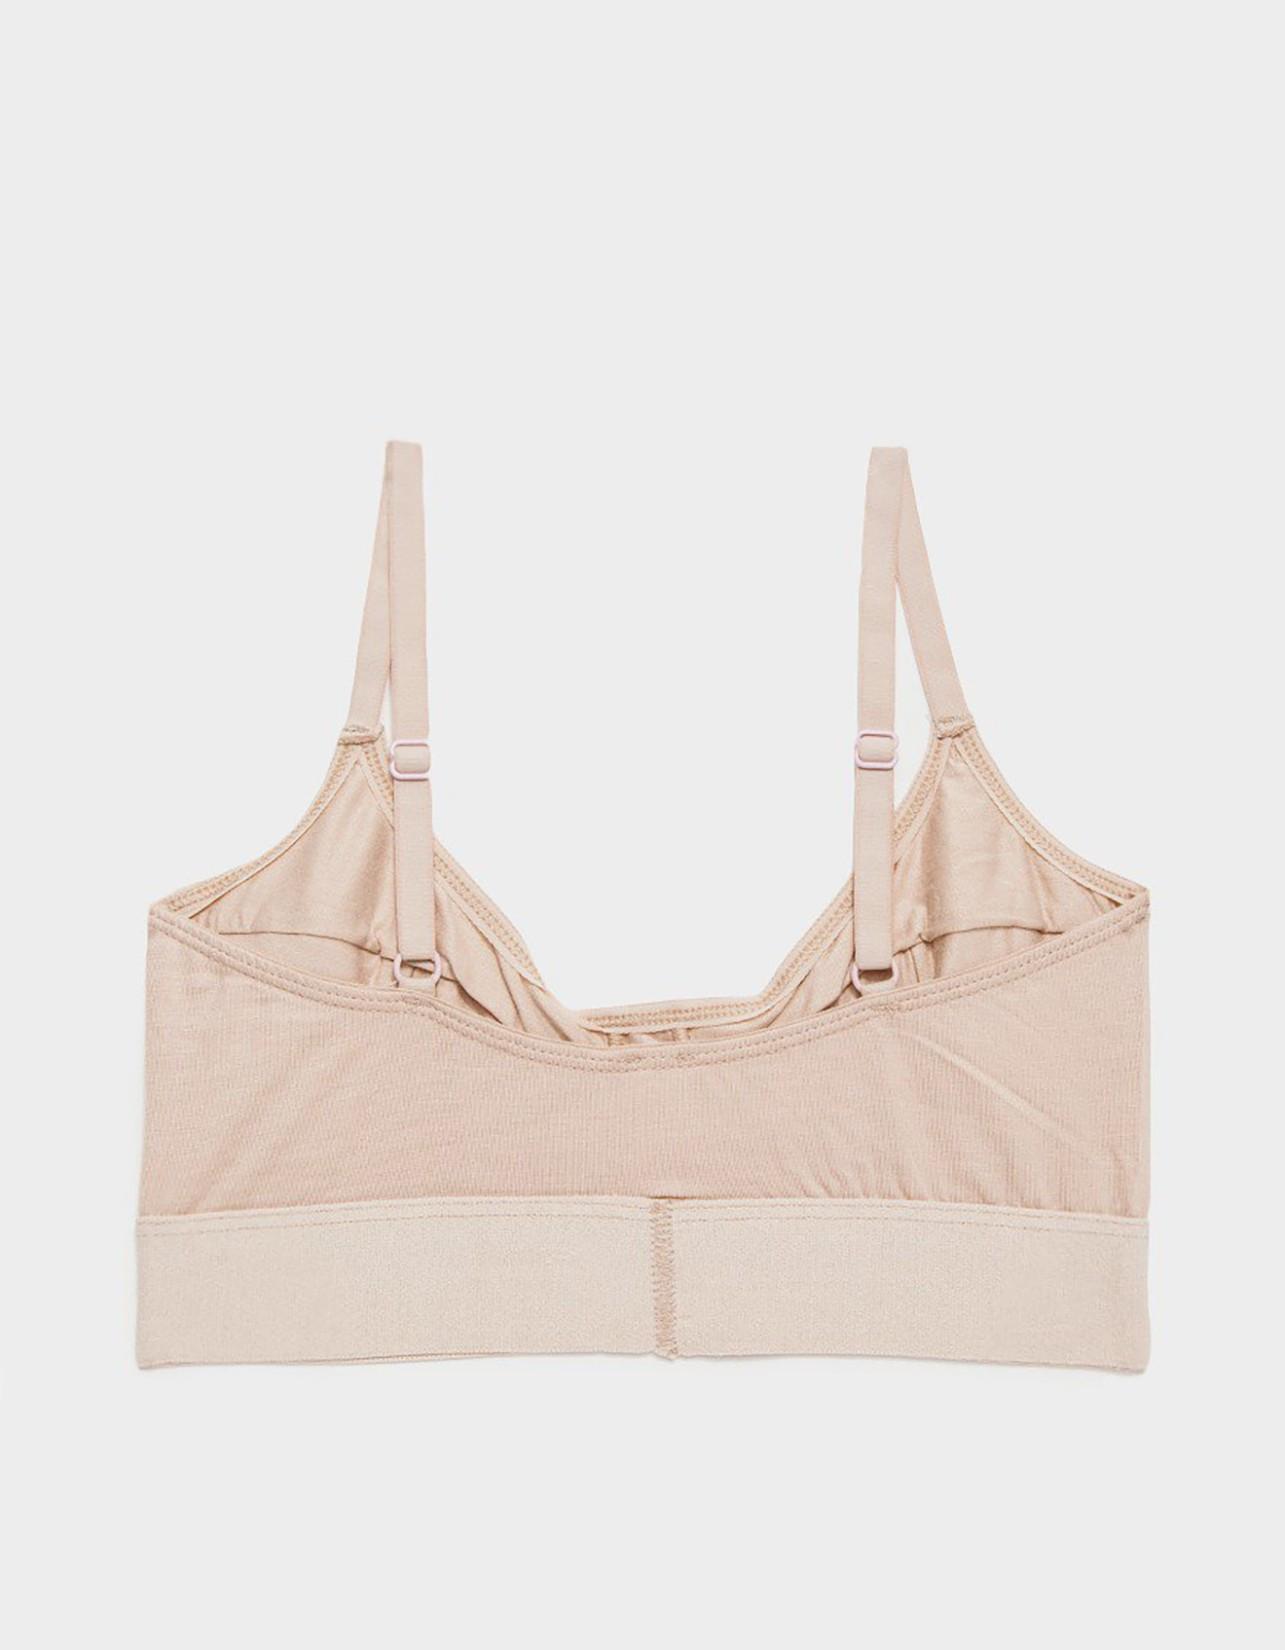 BASERANGE / Soft bra Nude